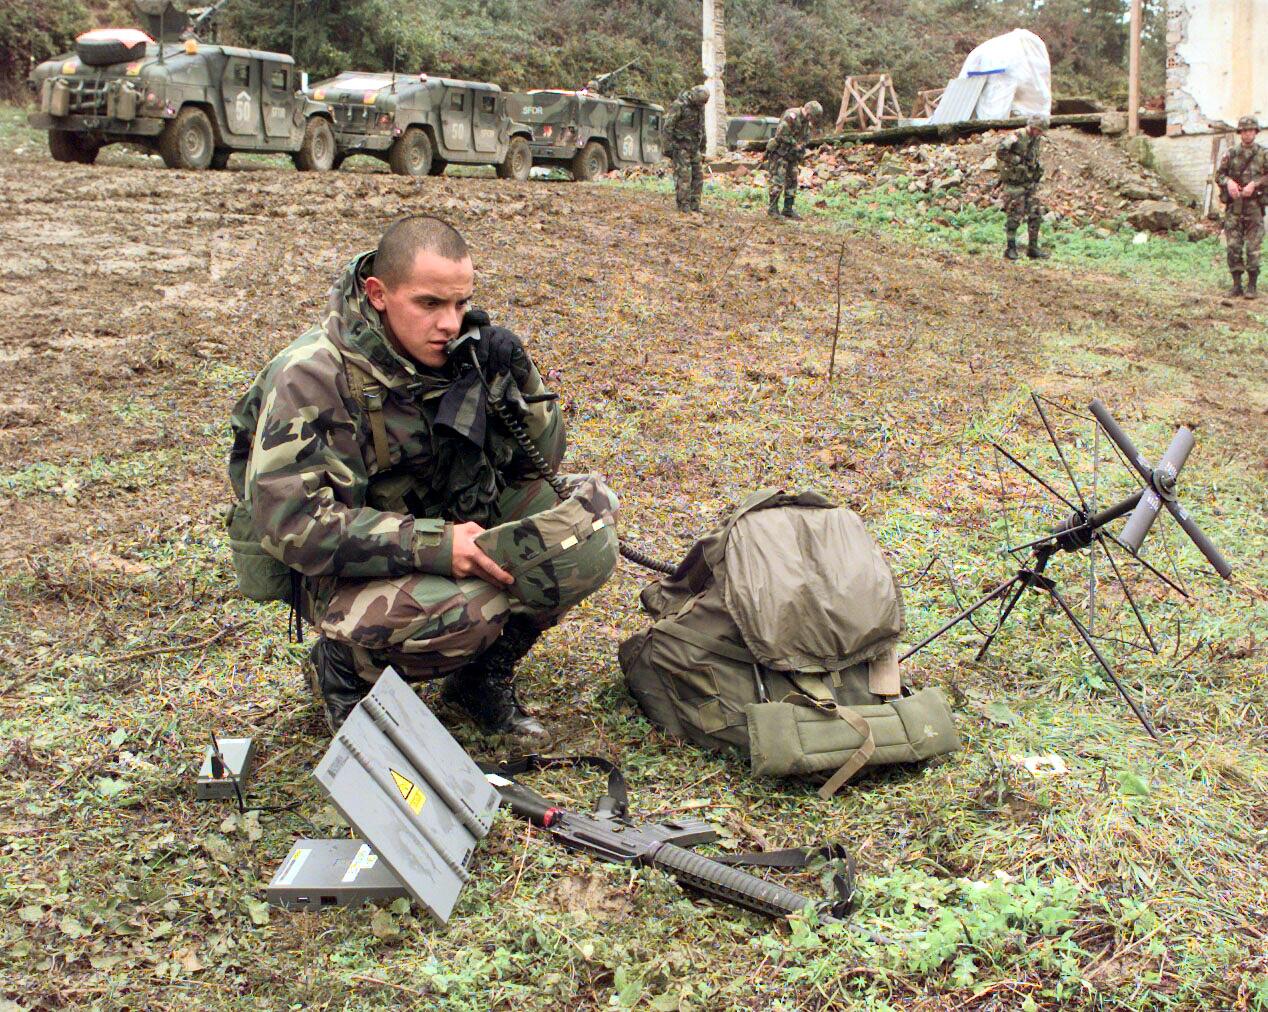 US-Army-Satellite-Phone-Skugrici-Bosnia-